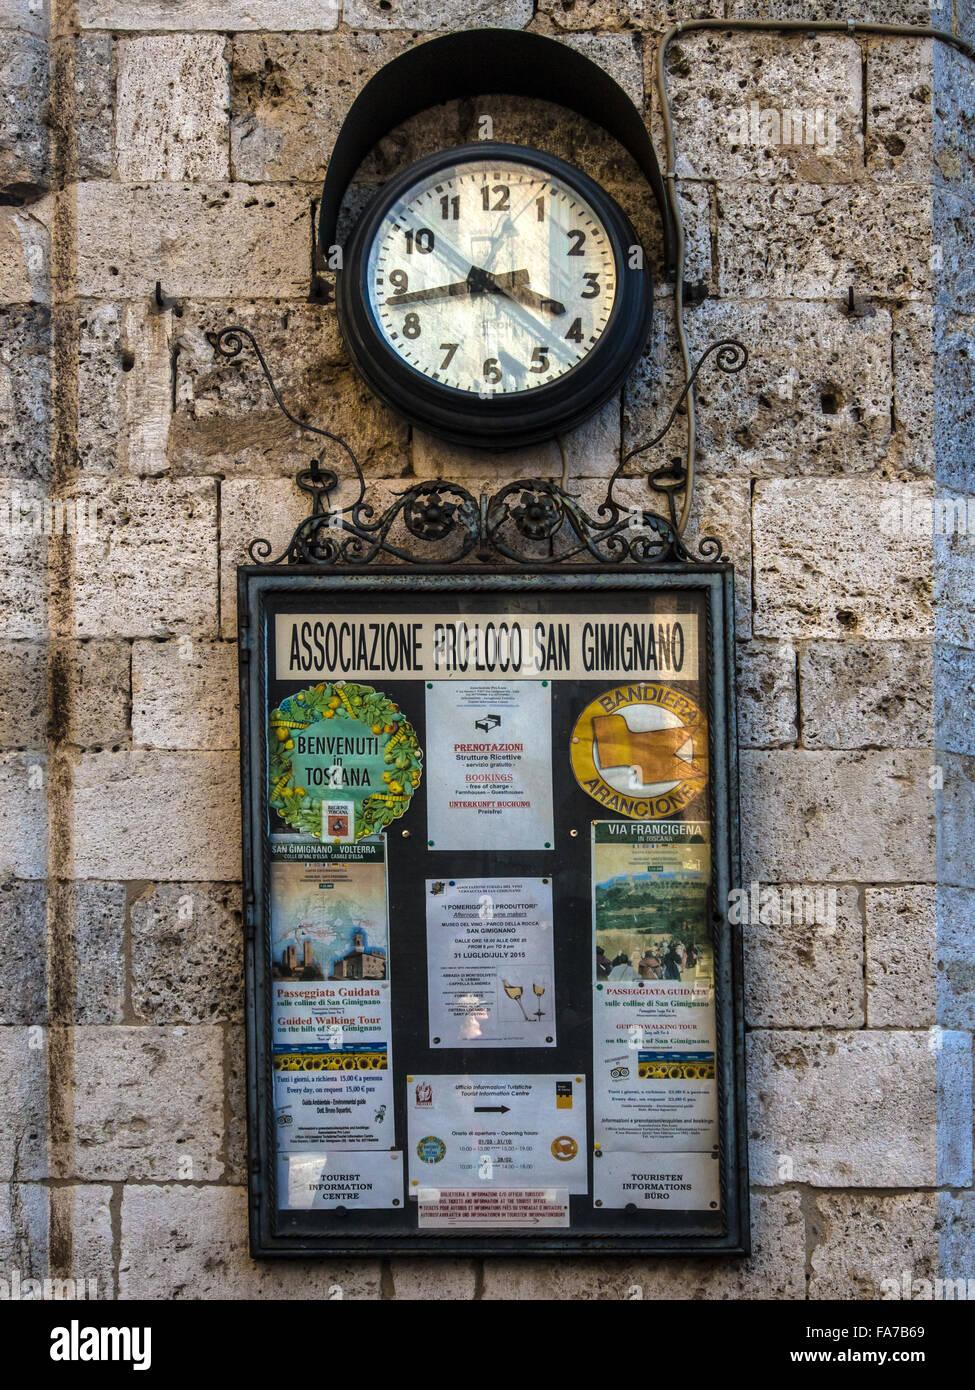 Local public noticeboard in San Gimignano, Tuscany, Italy - Stock Image